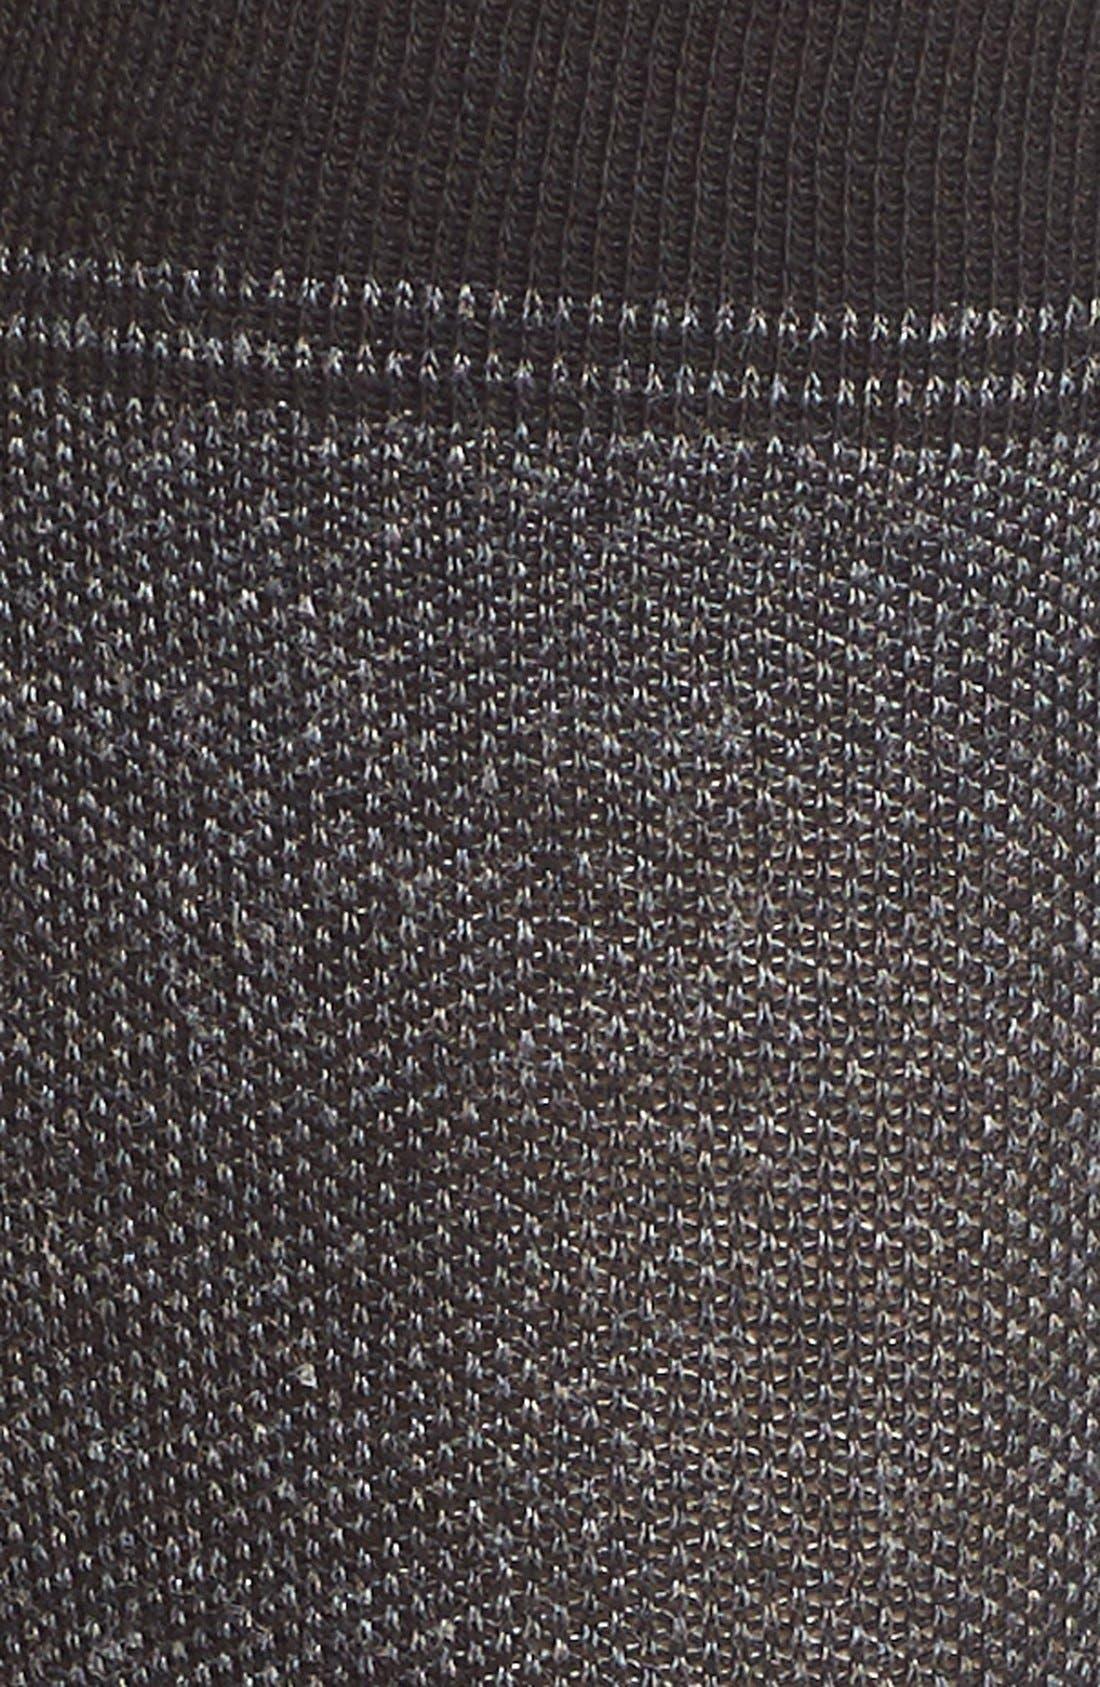 Alternate Image 2  - Sockwell 'Rejuvenator' Compression Knee Socks